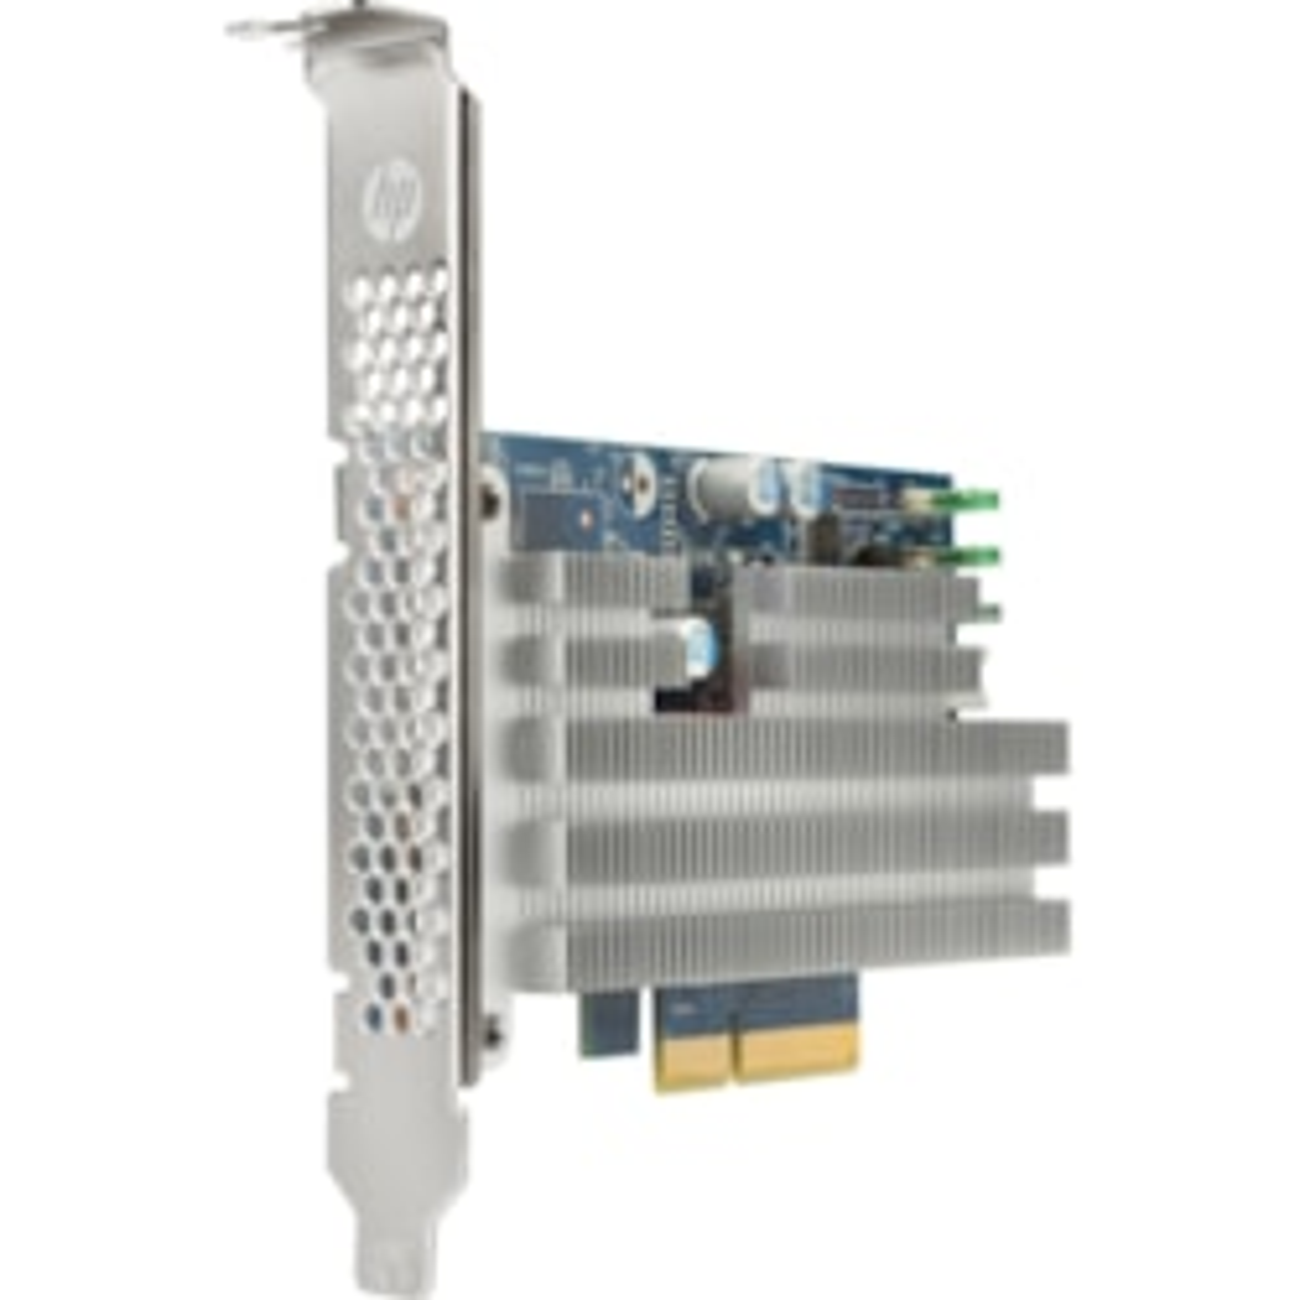 HP Turbo Drive G2 512 GB Solid State Drive - M.2 Internal - PCI Express